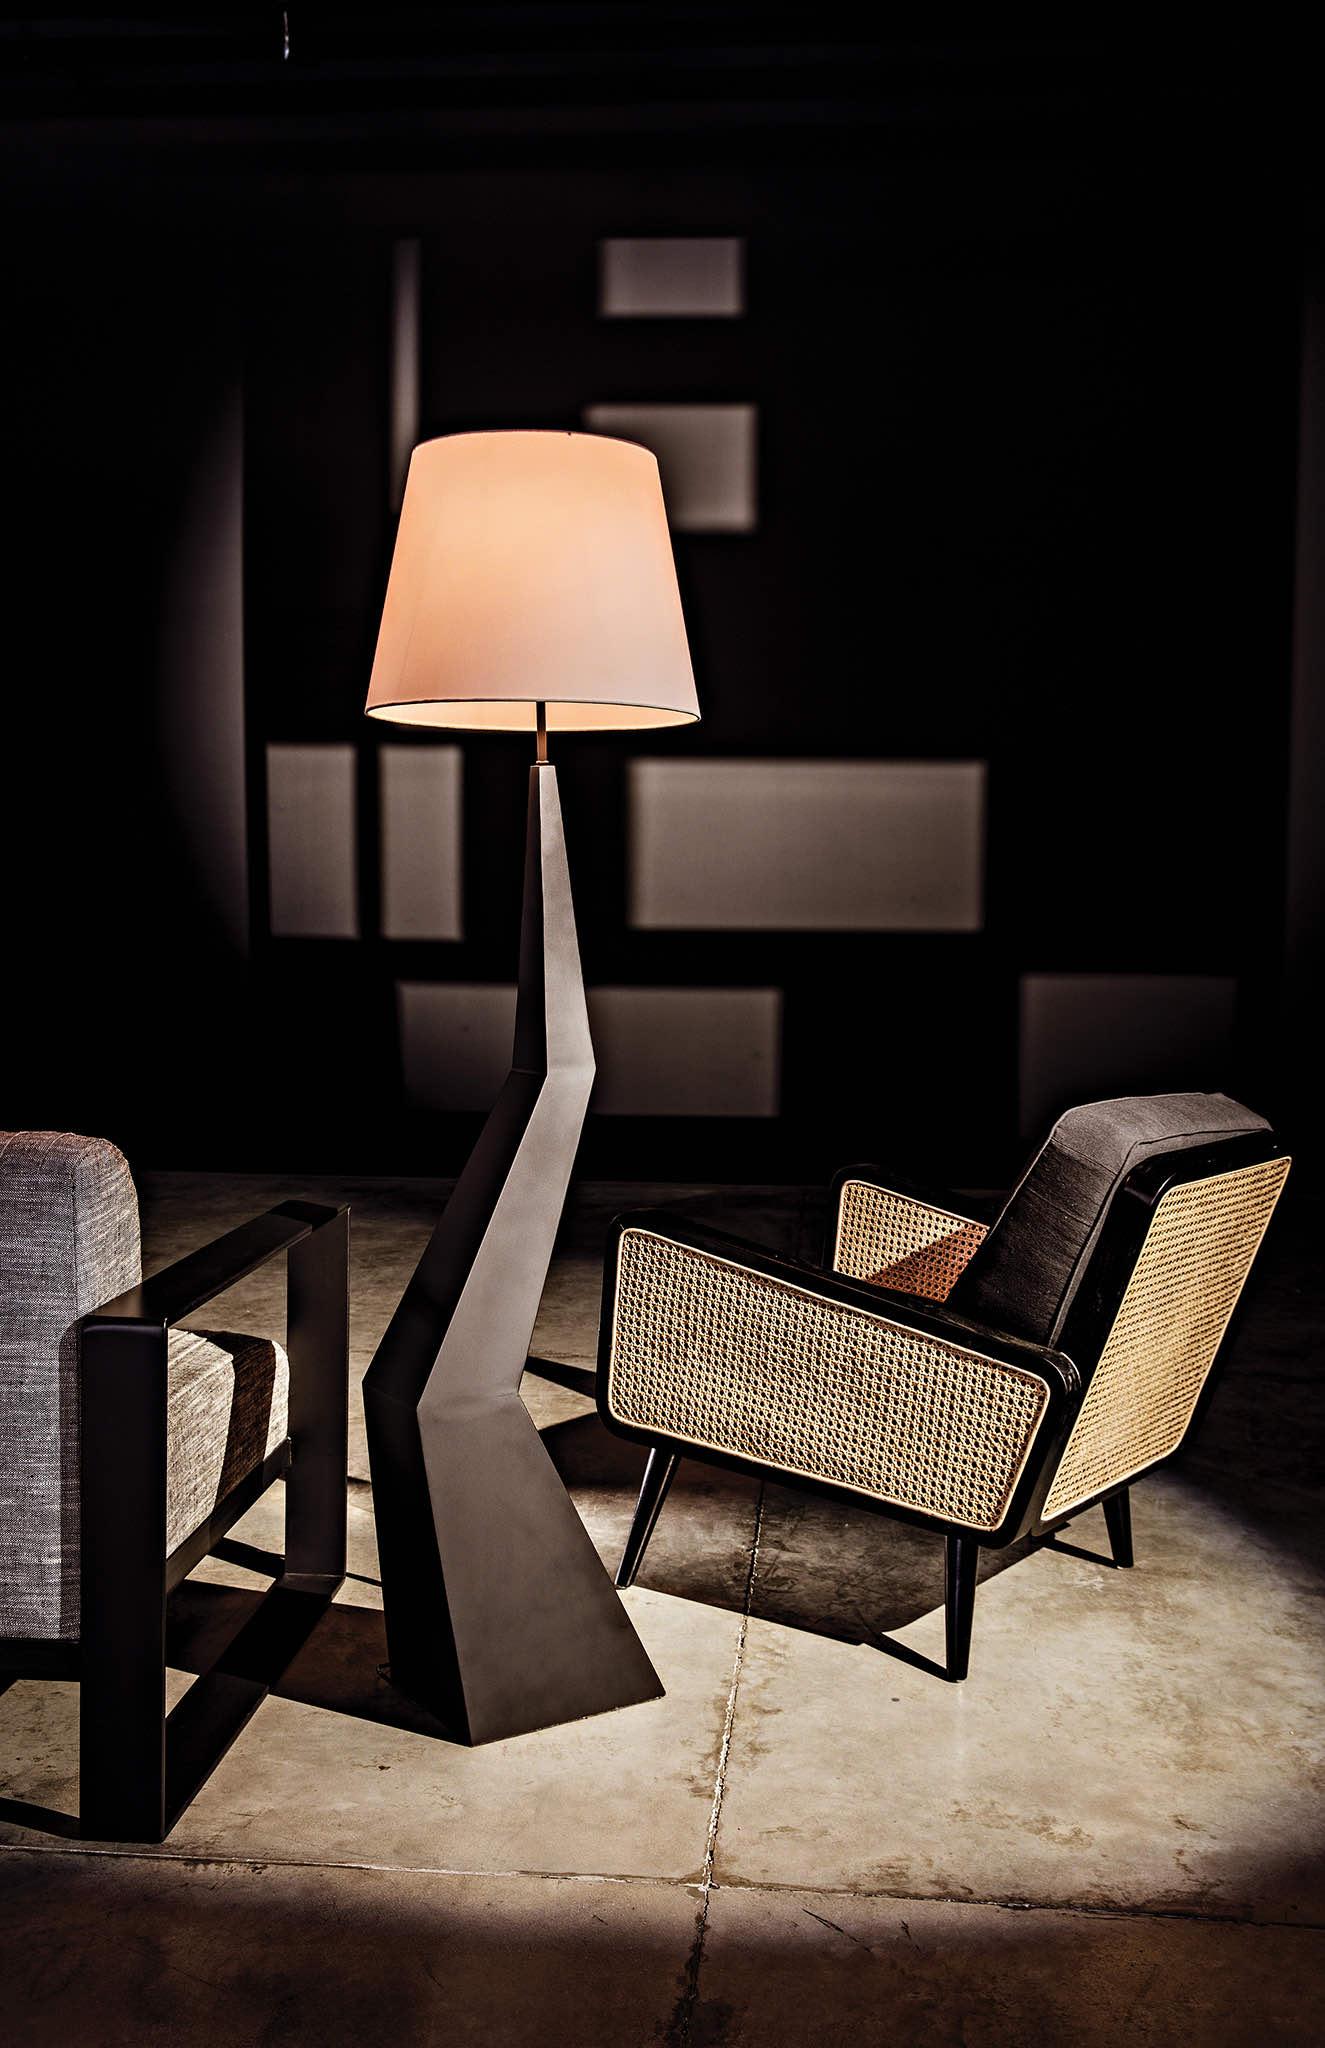 Rhombus Floor Lamp and Edward Chair